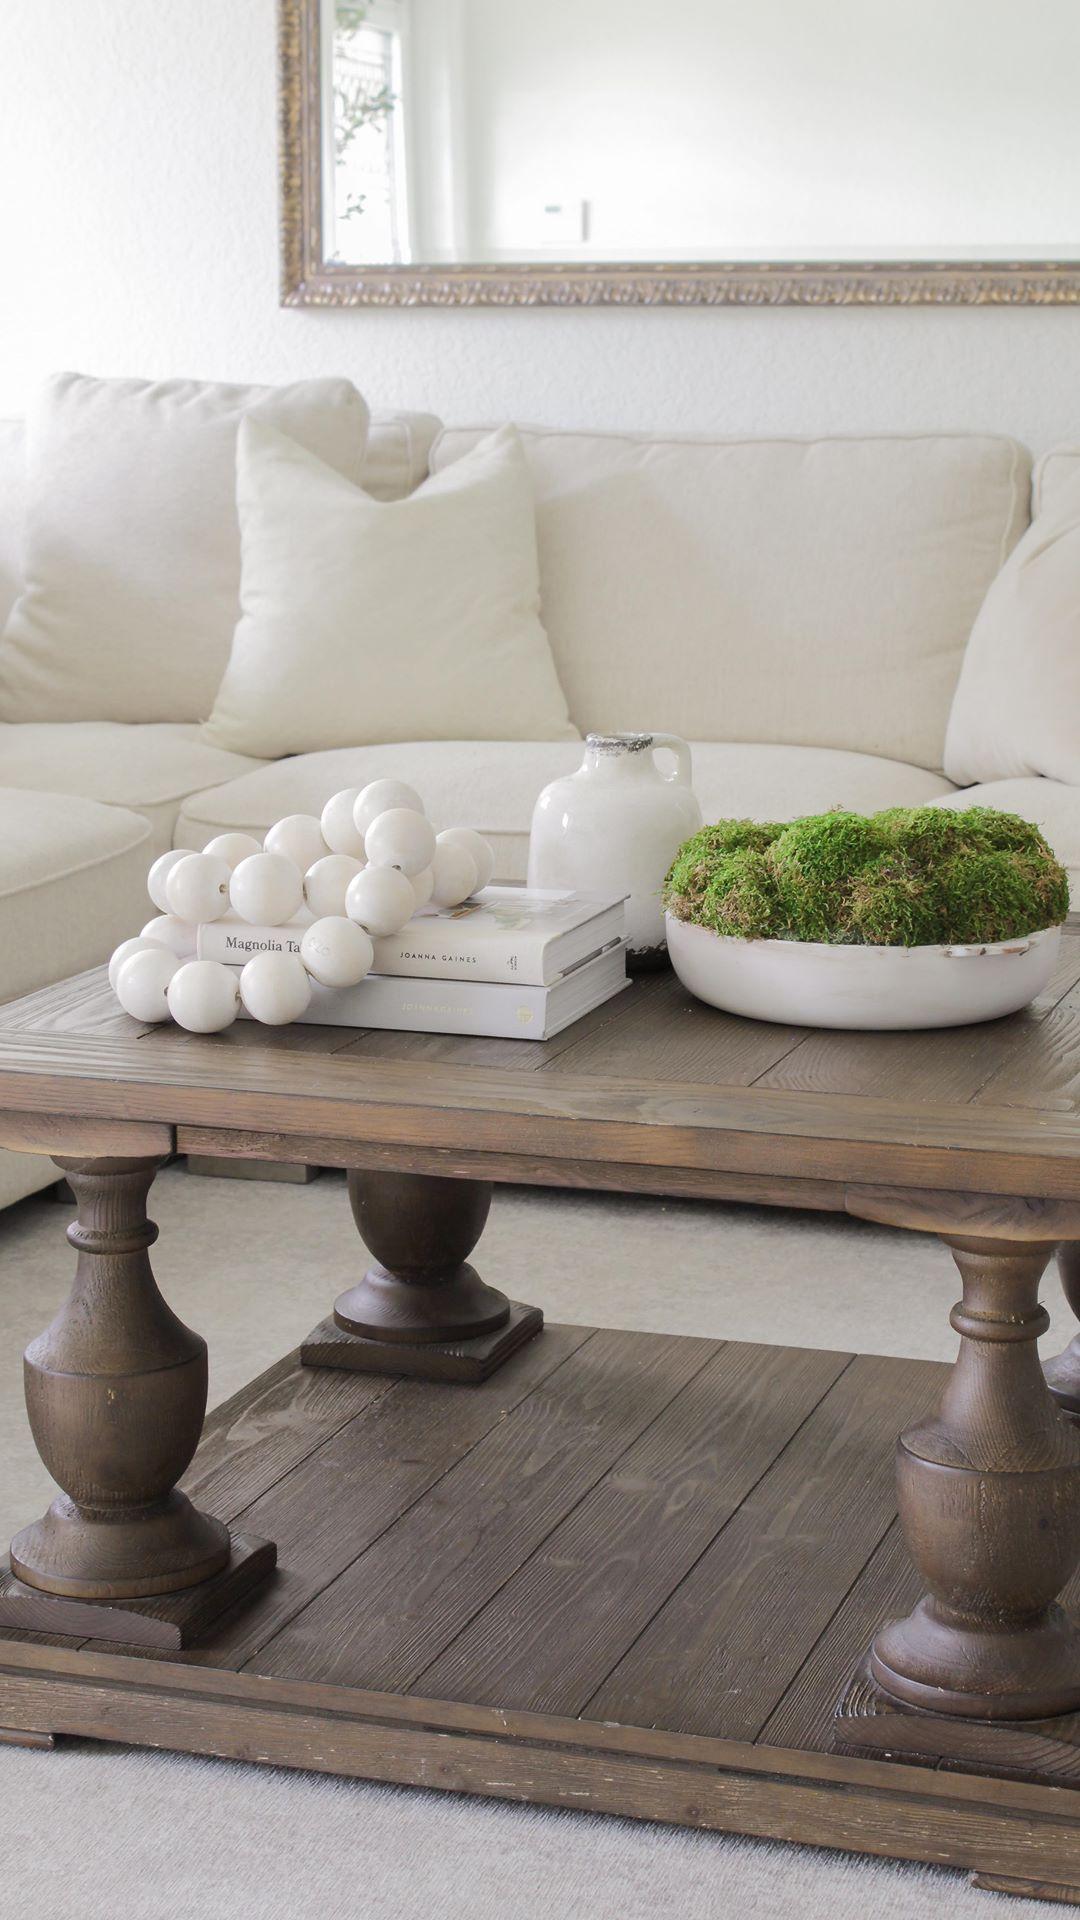 Living room table bowl